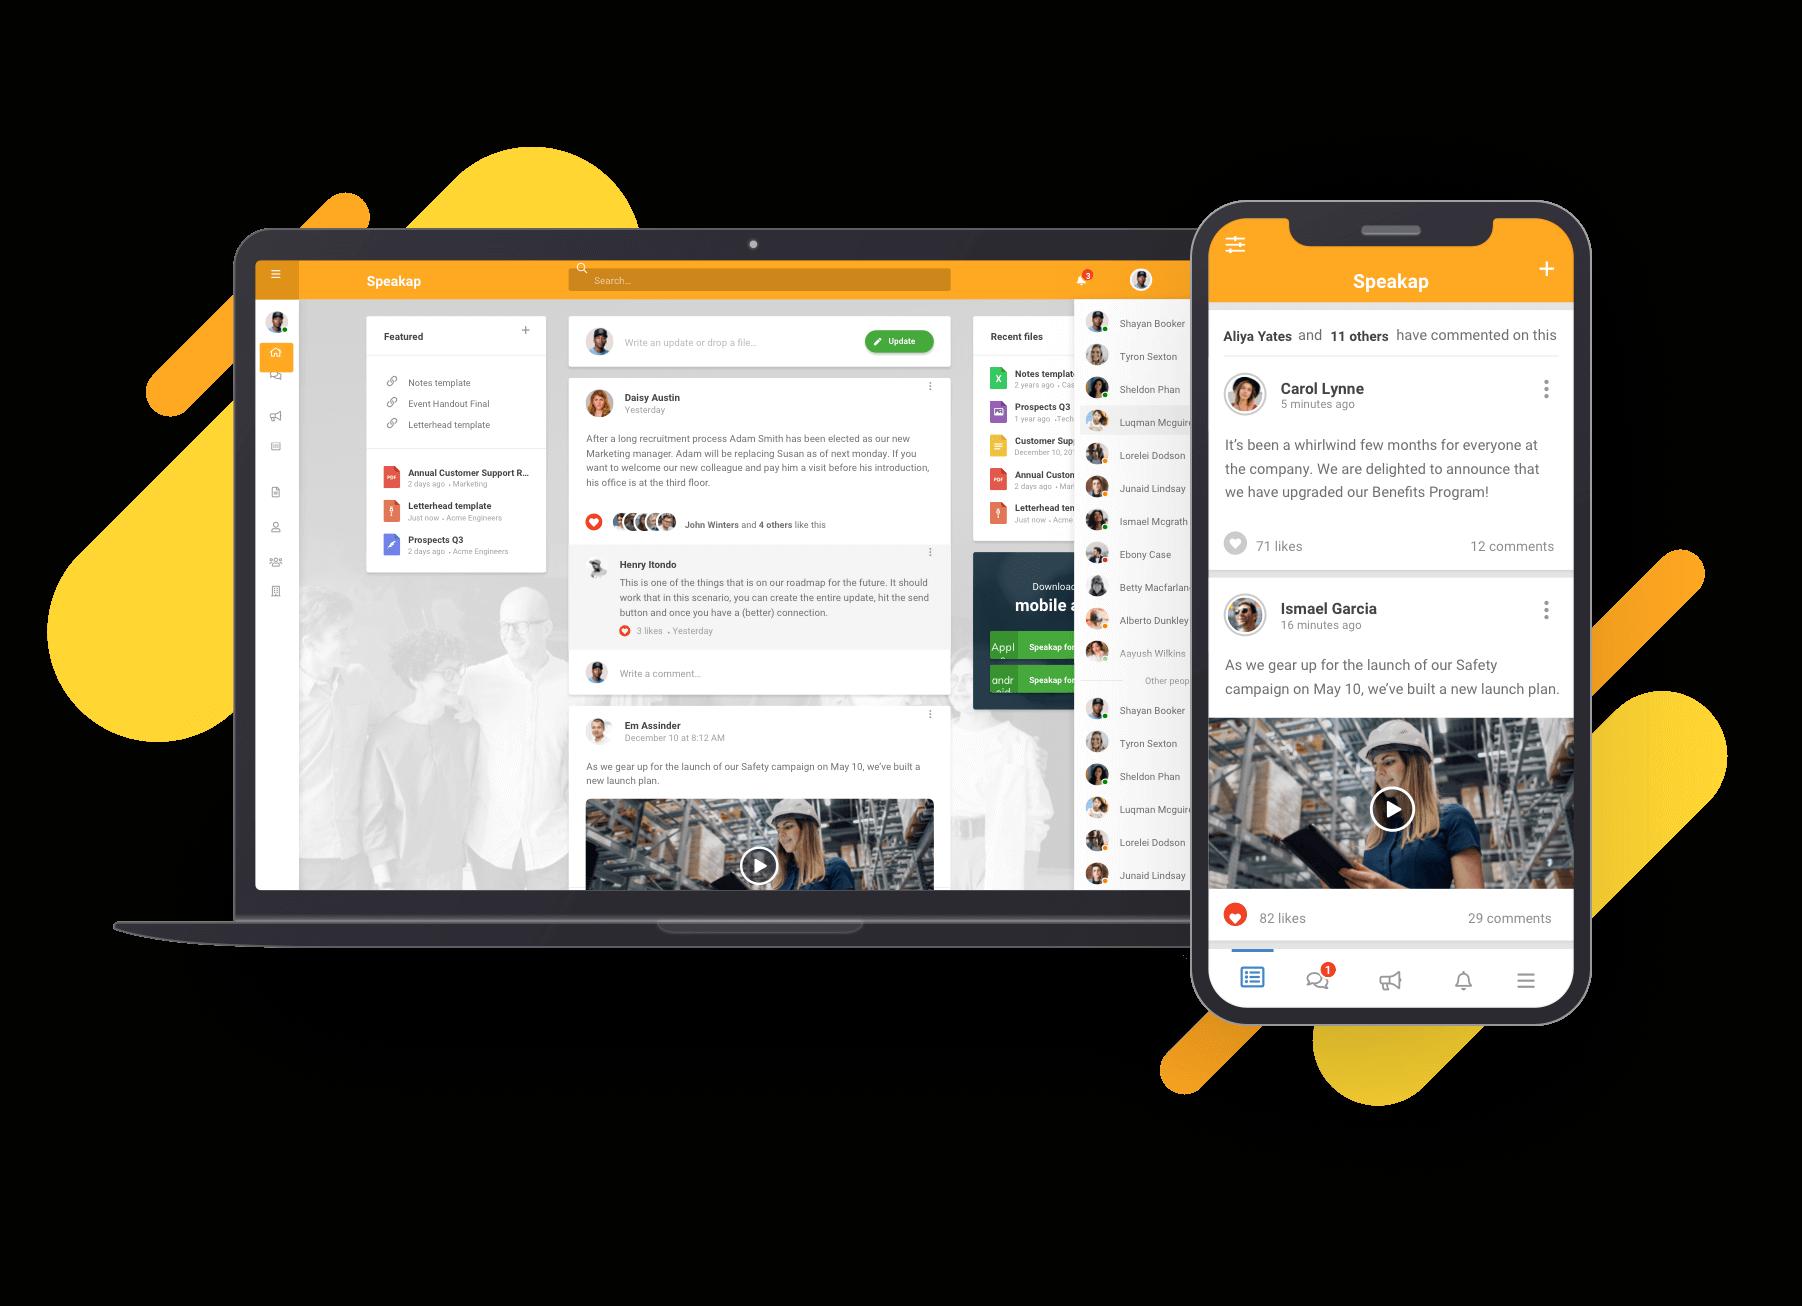 Speakap platform